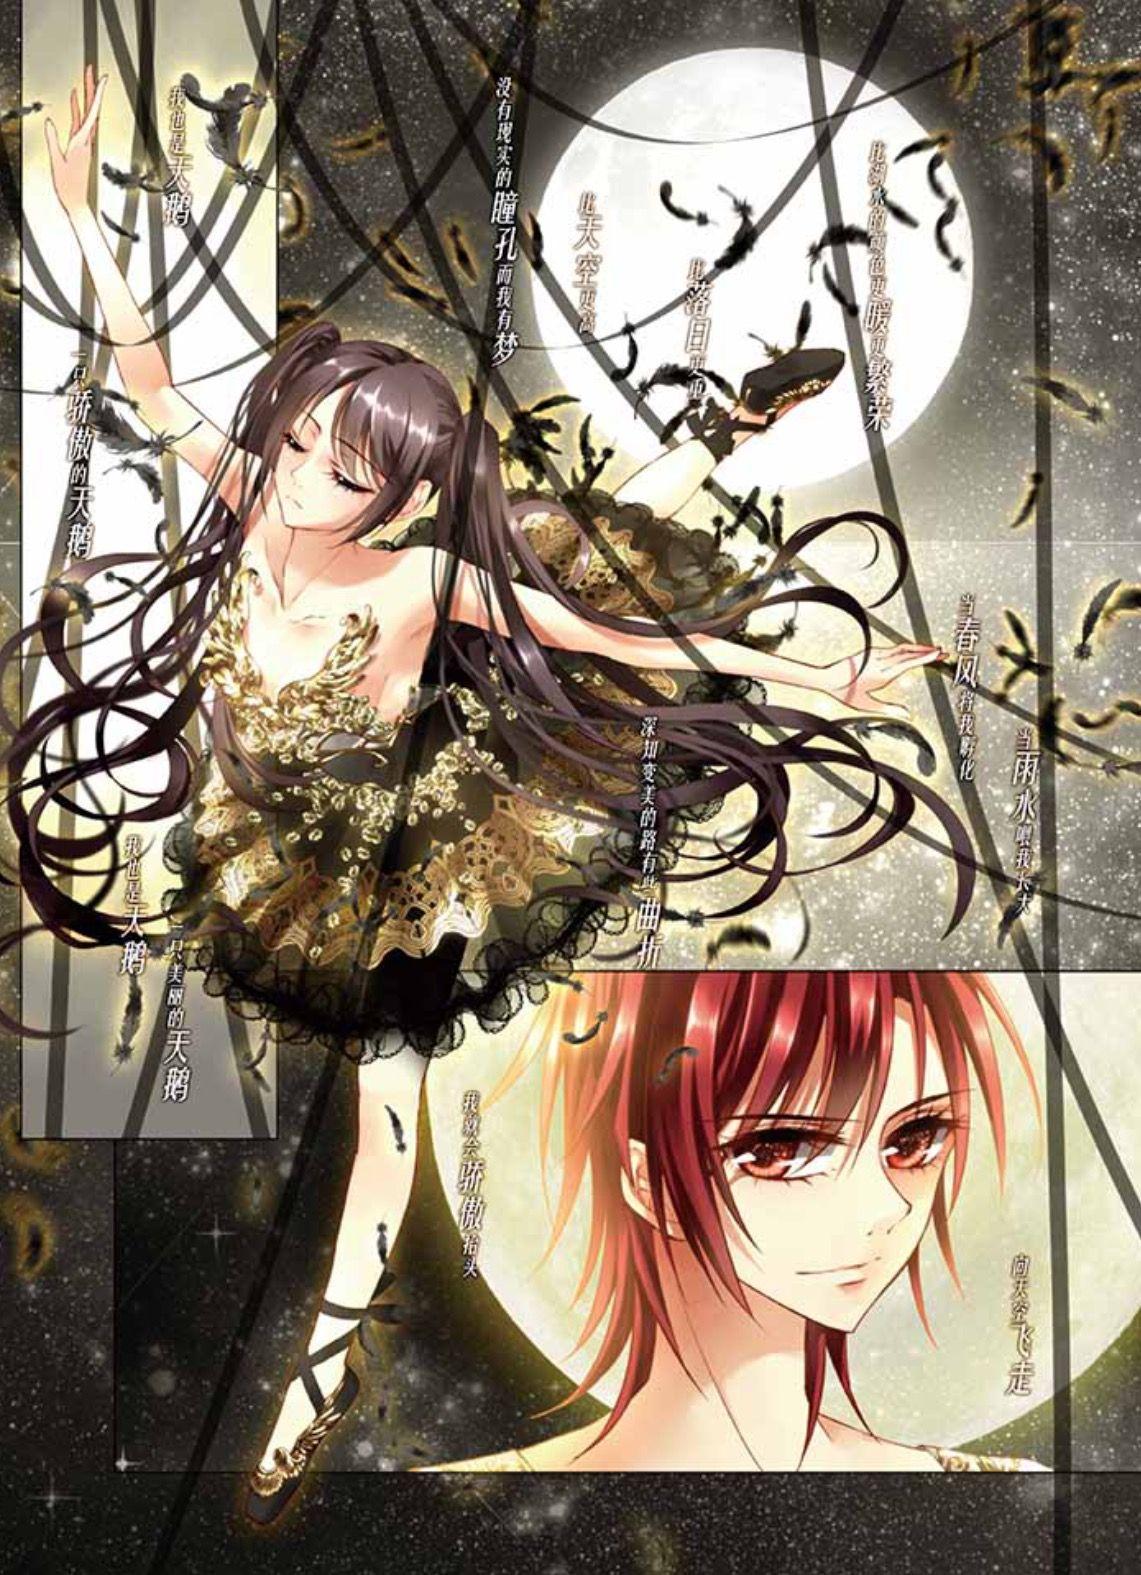 Idea by Vũ Quỳnh on Manhua Vampire sphere, Anime romance